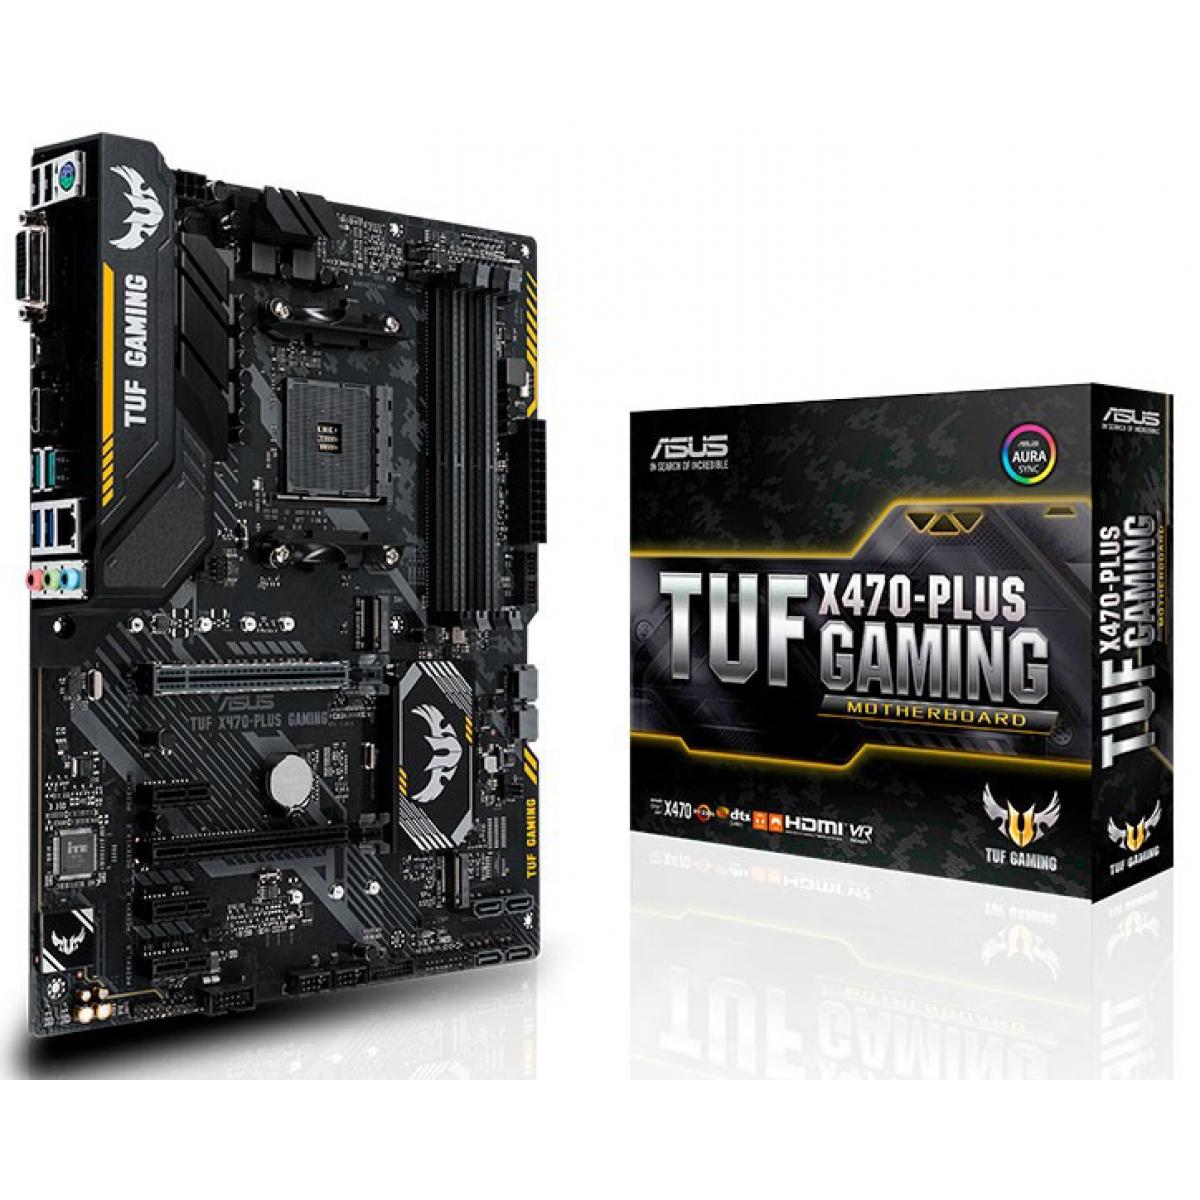 Placa Mãe Asus TUF X470-Plus Gaming, Chipset X470, AMD AM4, ATX, DDR4